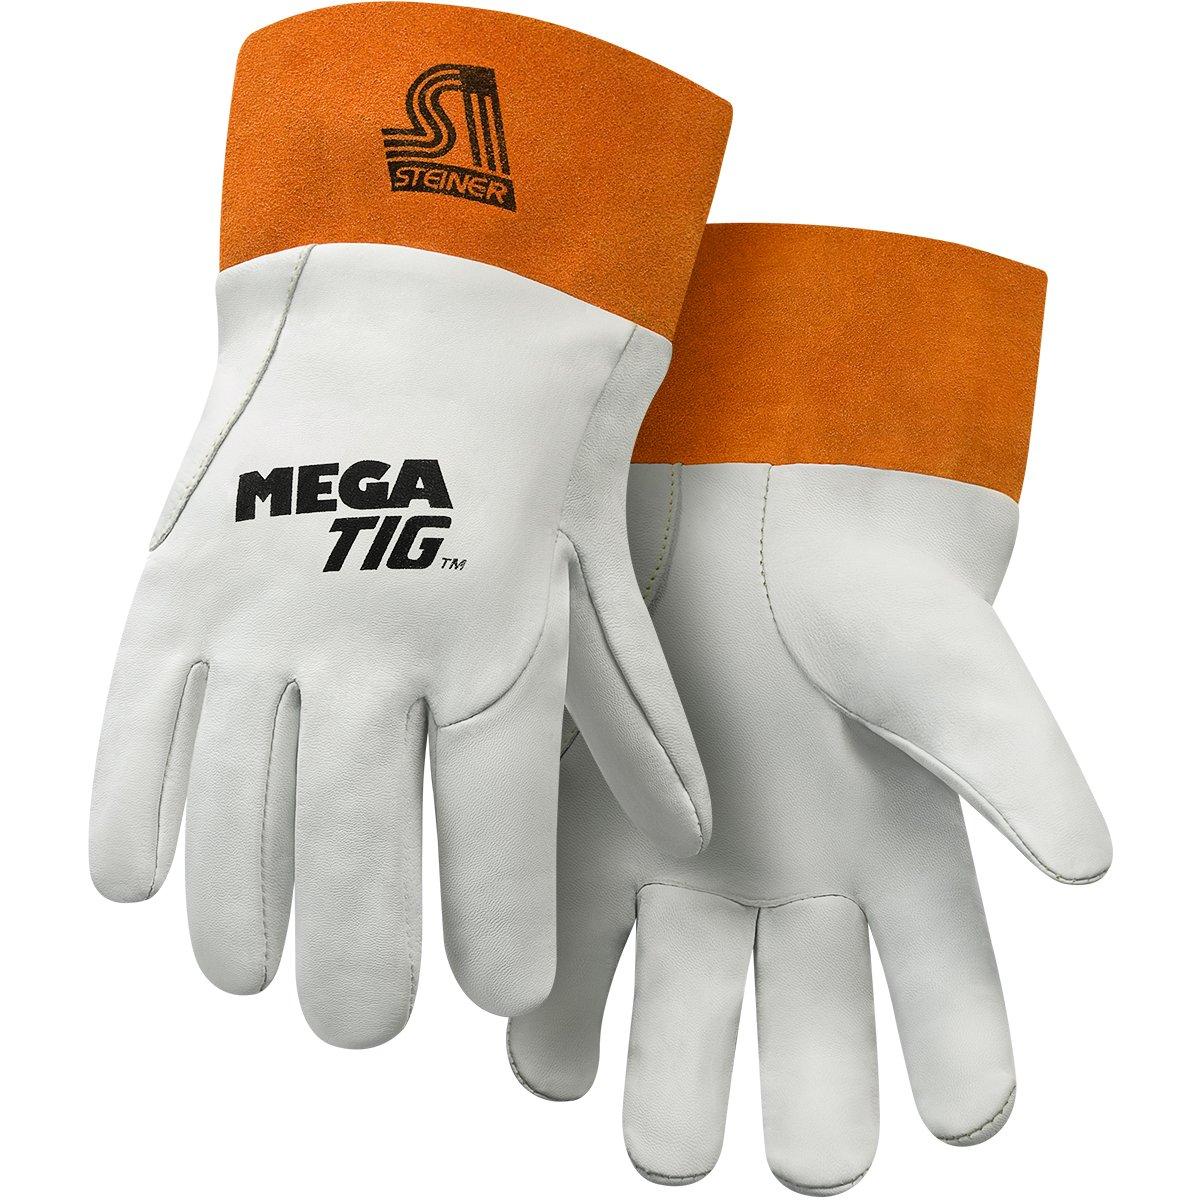 Grain Kidskin Foam Back Unlined Palm 2-Inch Cuff Steiner 0231-L Mega TIG Gloves Large